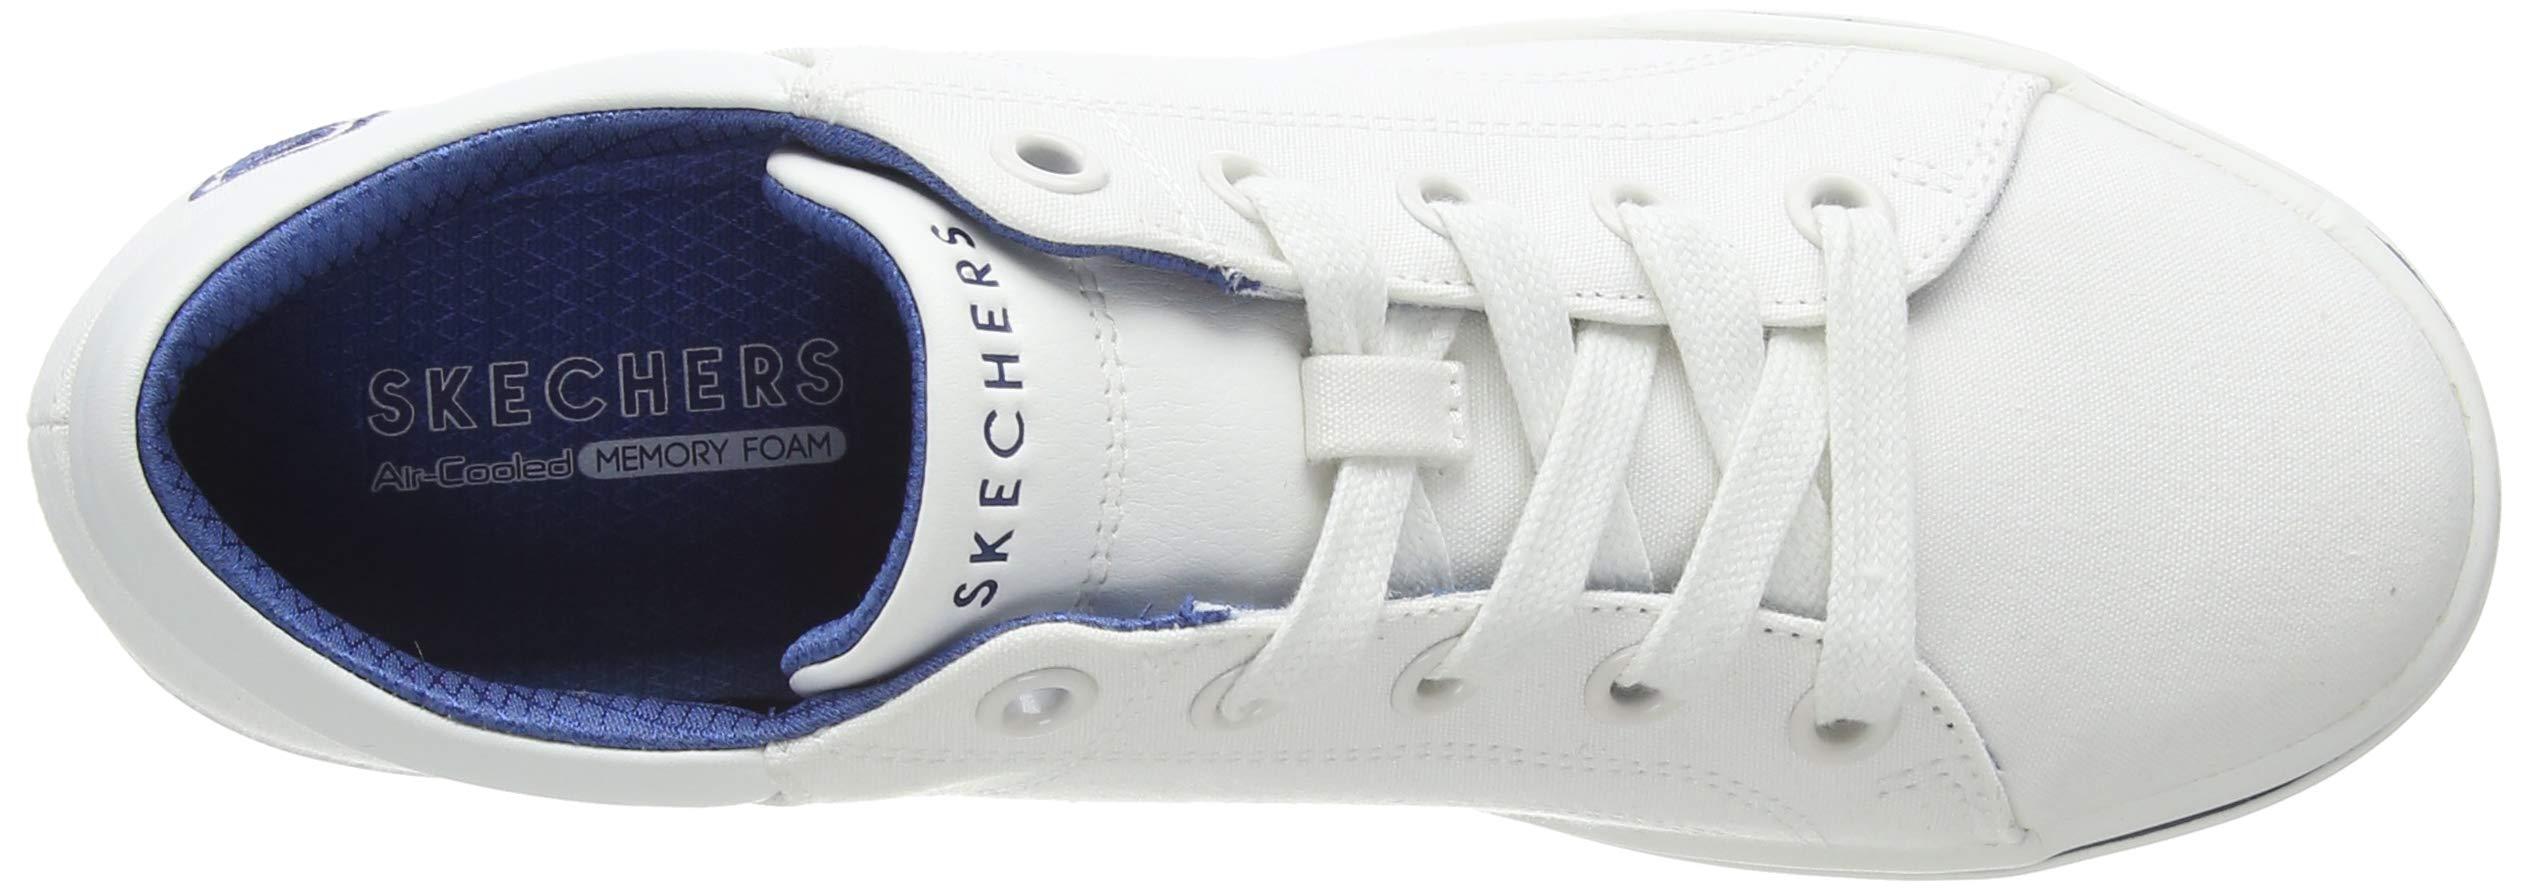 Skechers Women's Street Cleat. Canvas Contrast Stitch Lace Up Sneaker